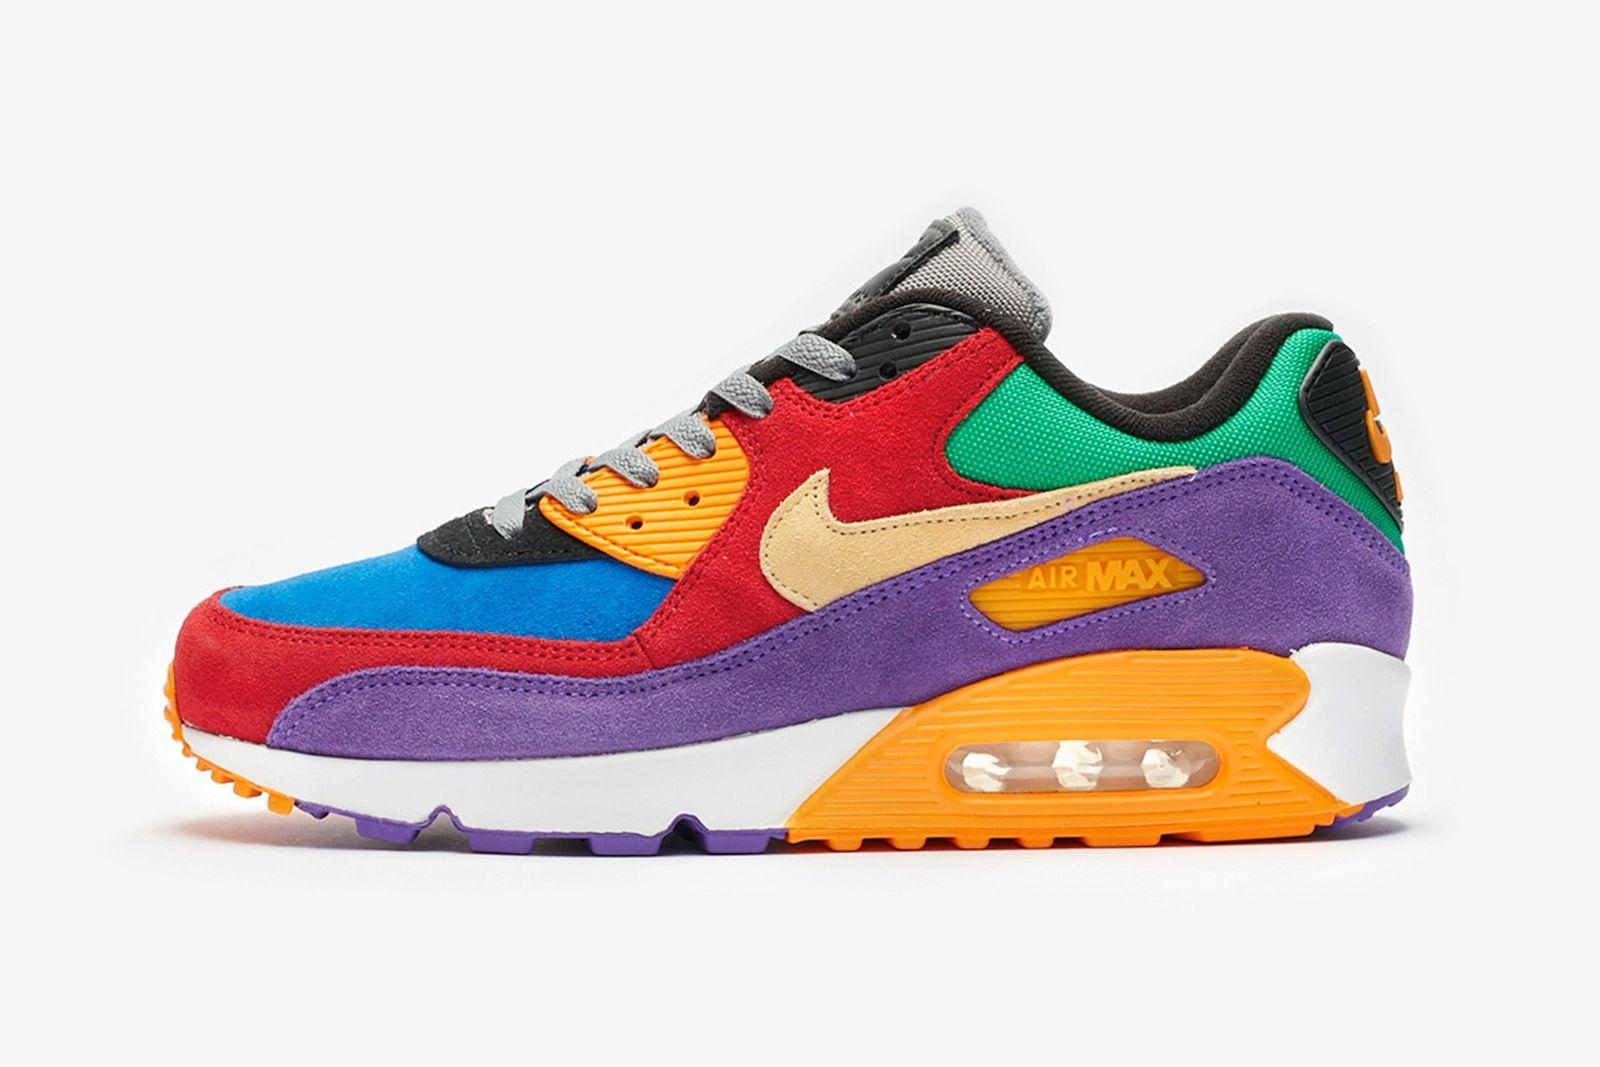 nike air max 90 viotech qs release date price Nike Viotech